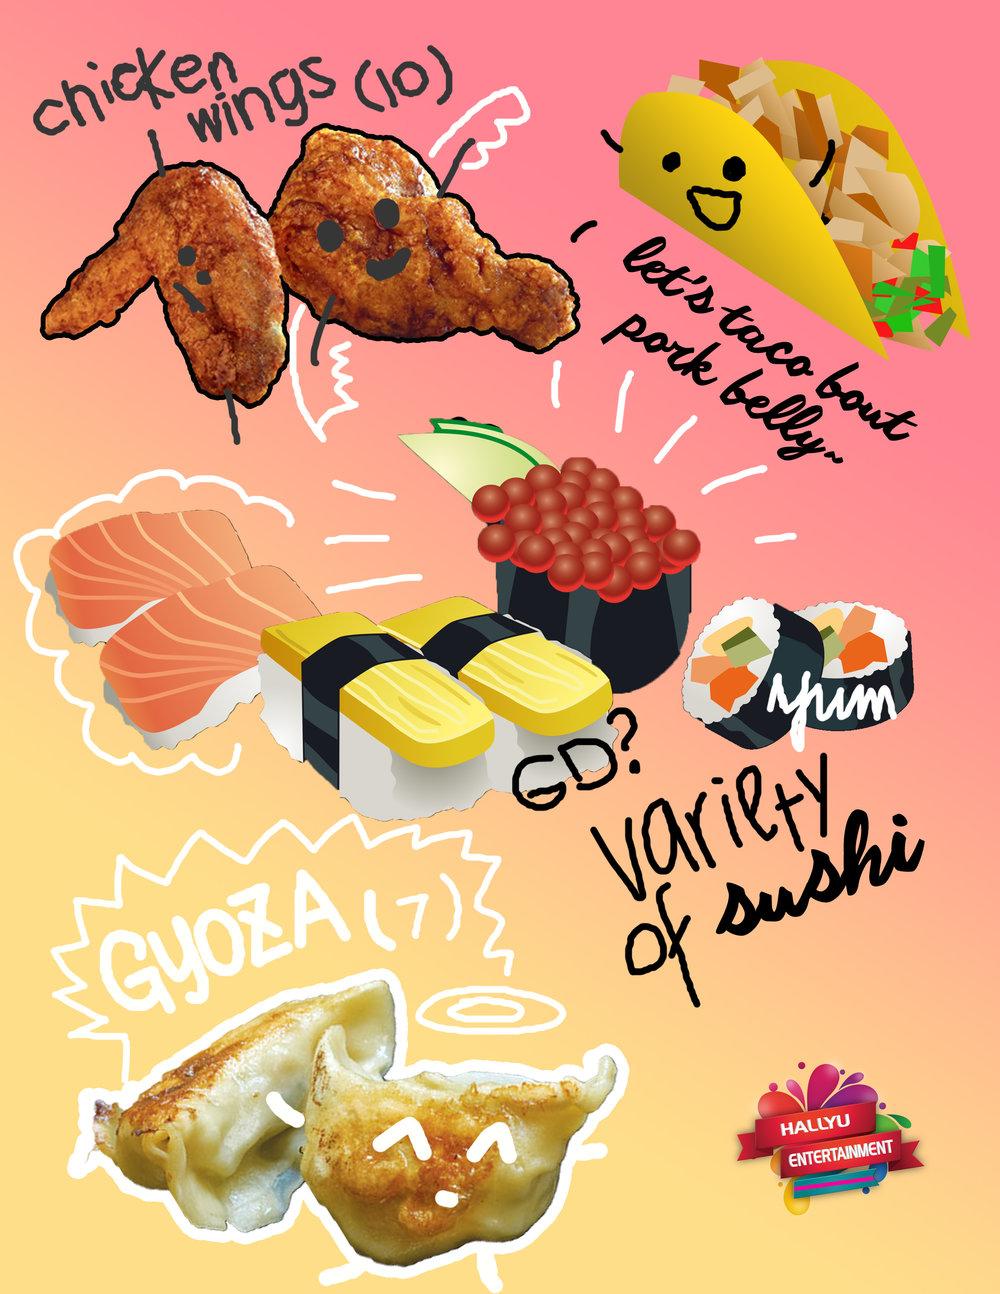 houston food menu.jpg